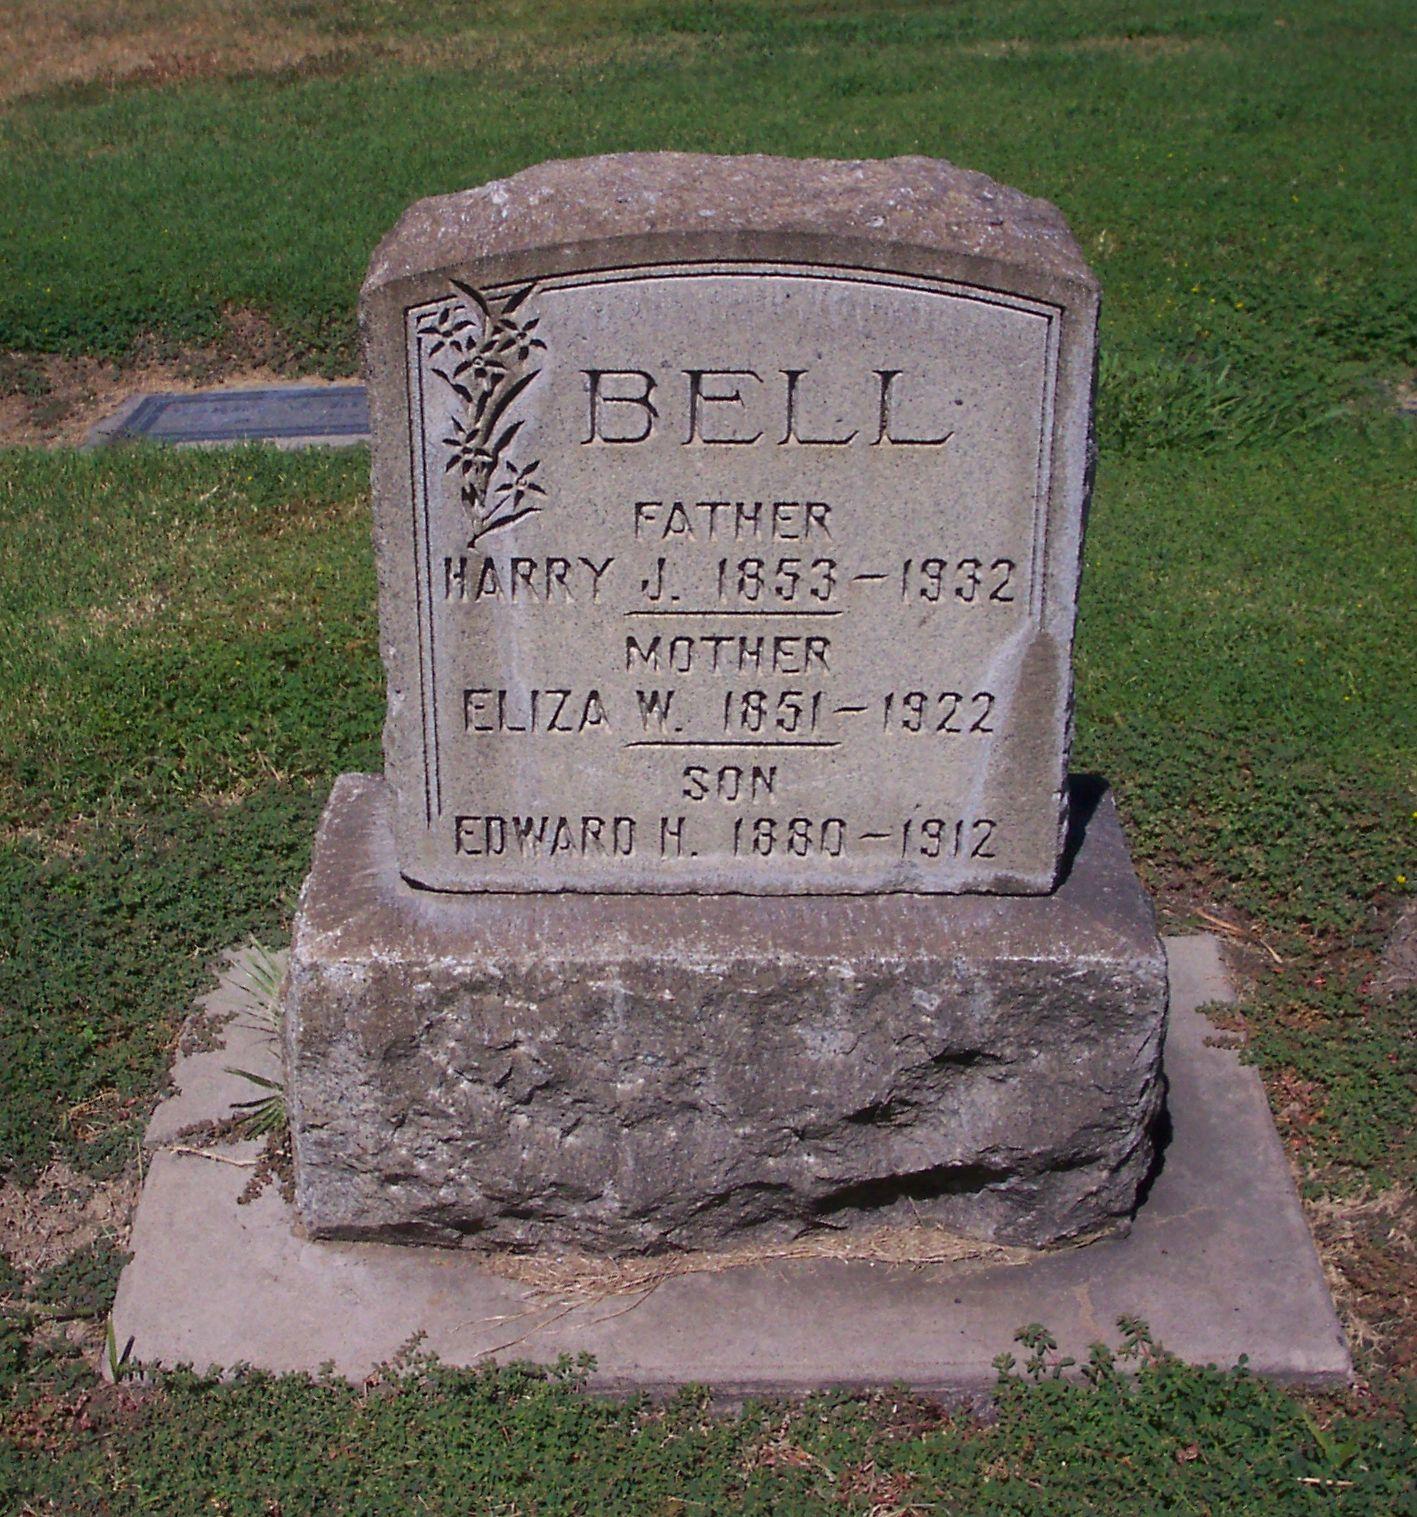 Edward H. Bell